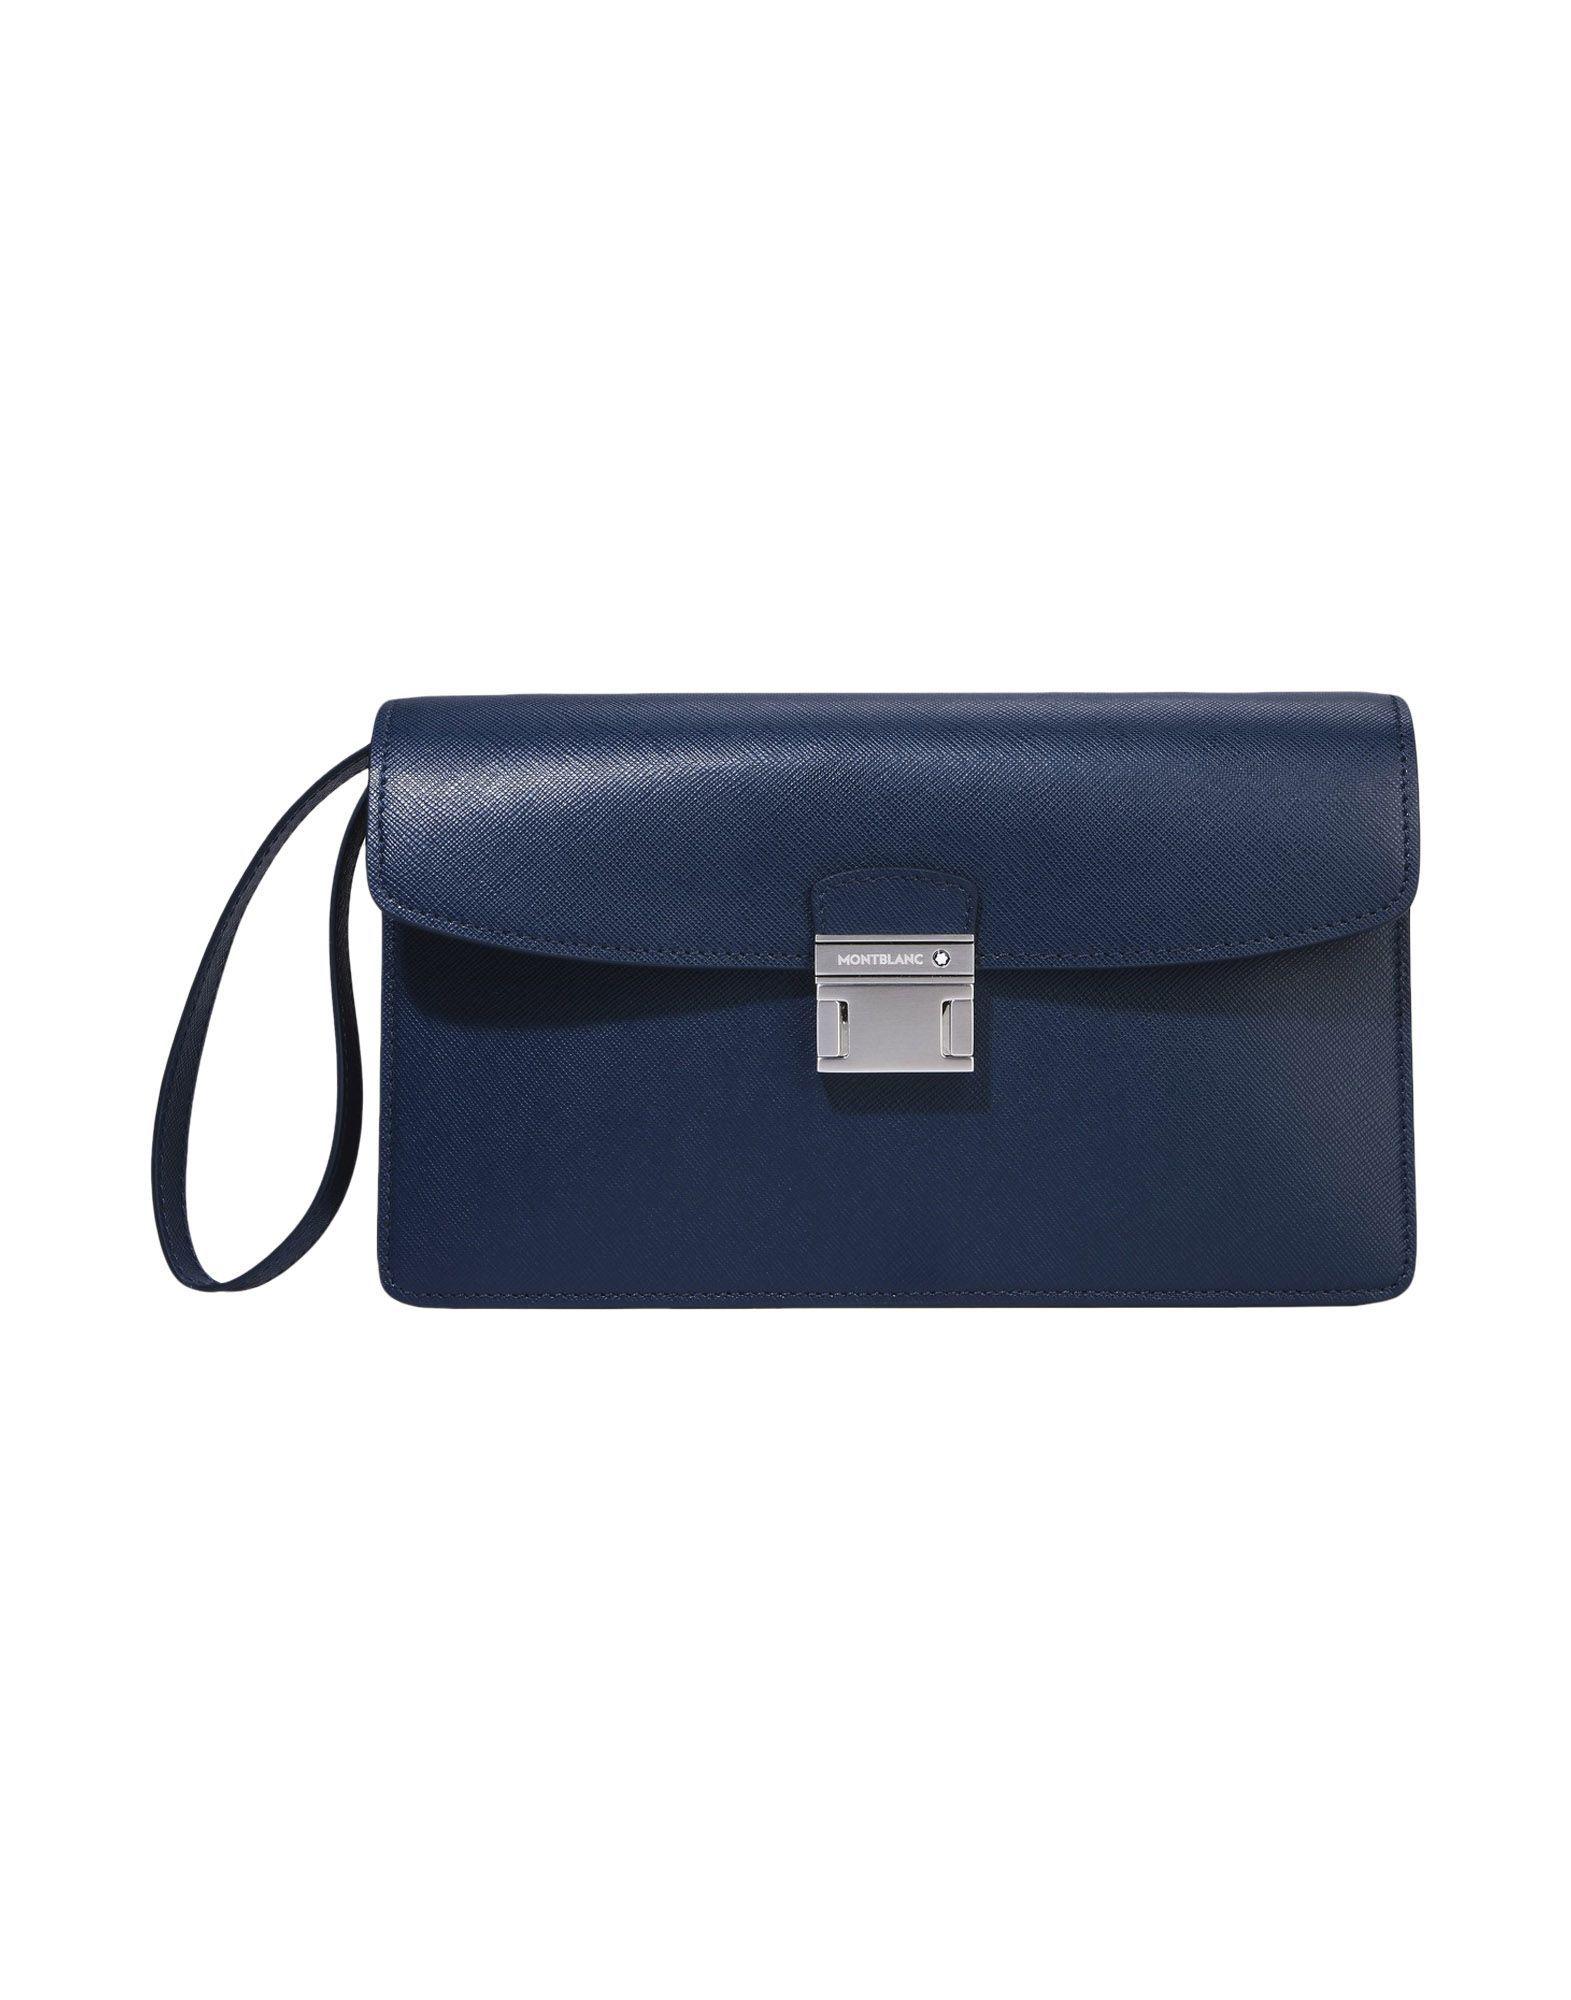 0ad7d5528069 Montblanc Handbag - Men Montblanc Handbags online on YOOX Vietnam -  45406860IQ